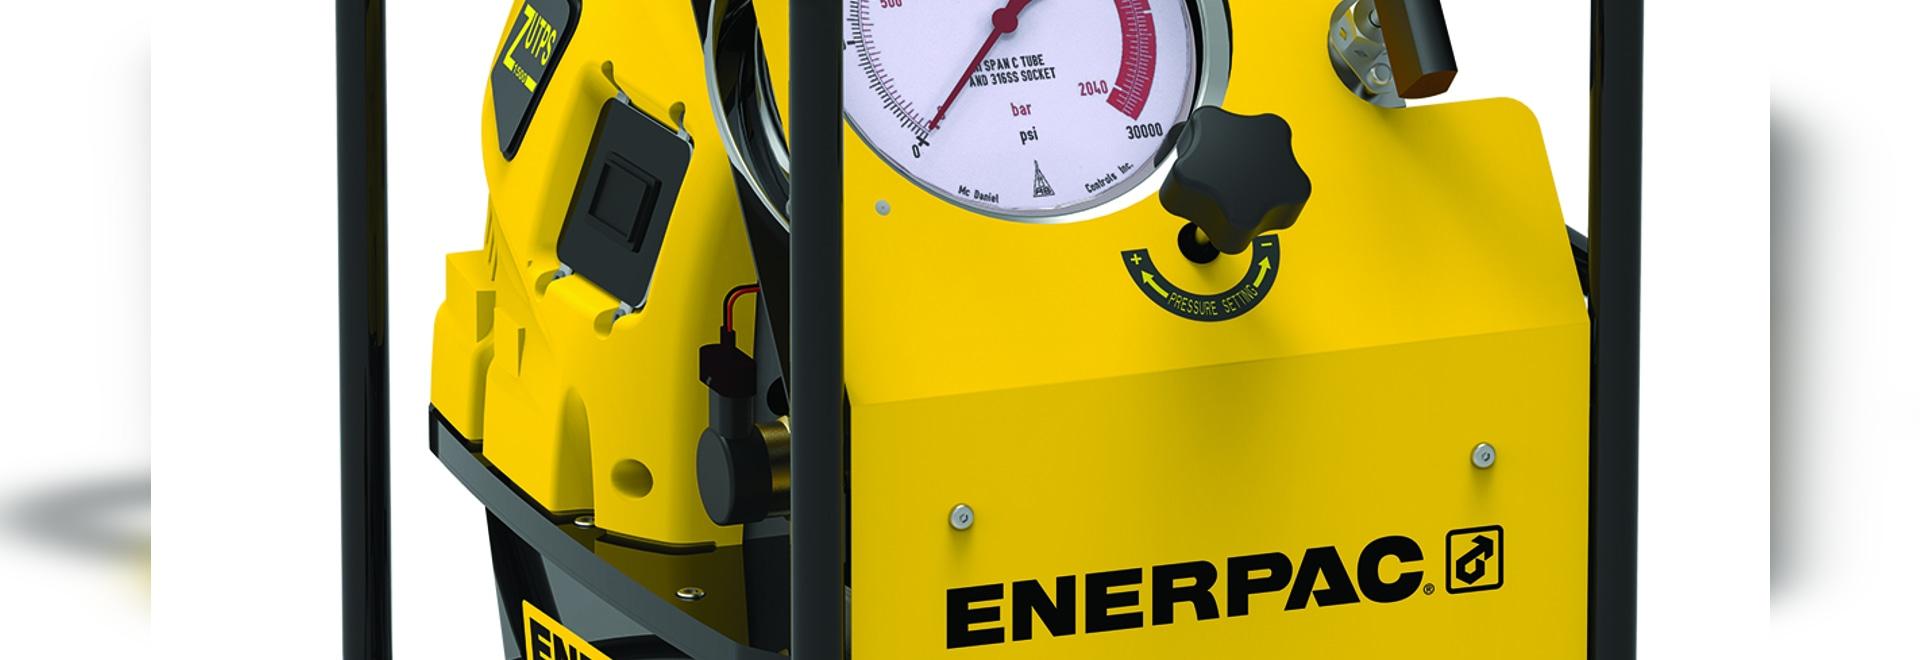 Enerpac ZUTP1500-S Series Electric Tensioning Pump